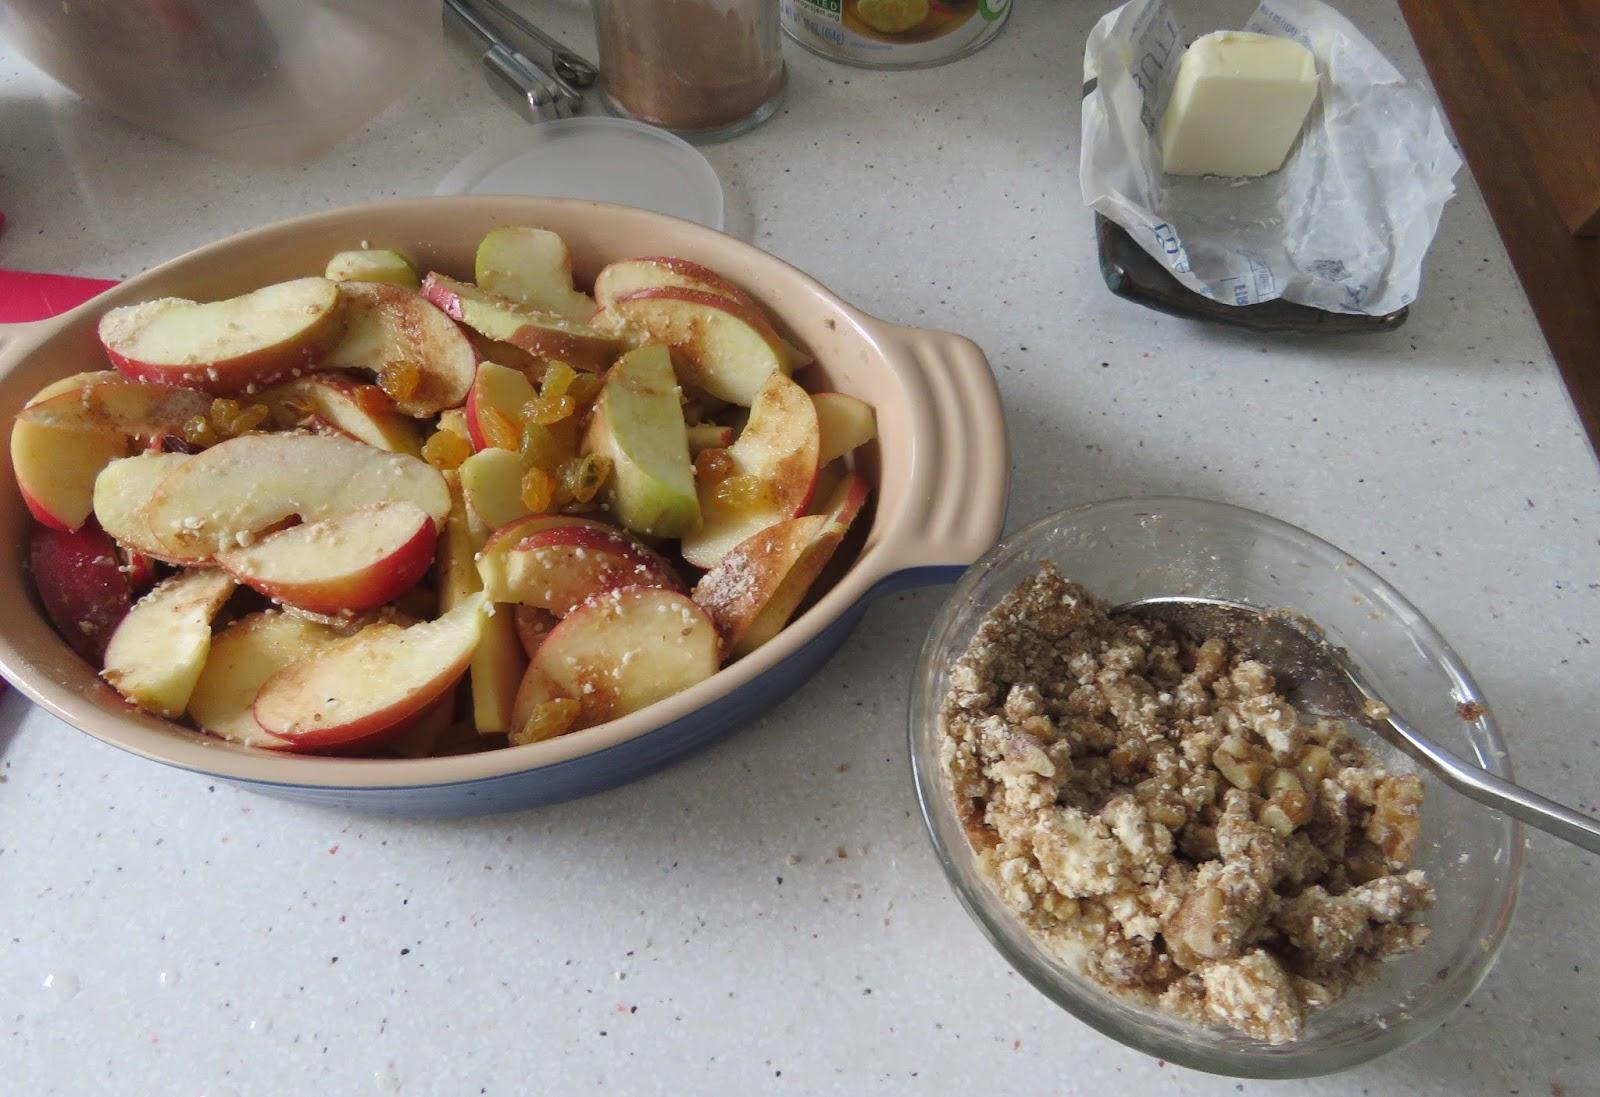 Mae's Food Blog: Passover: Too Many Recipes?